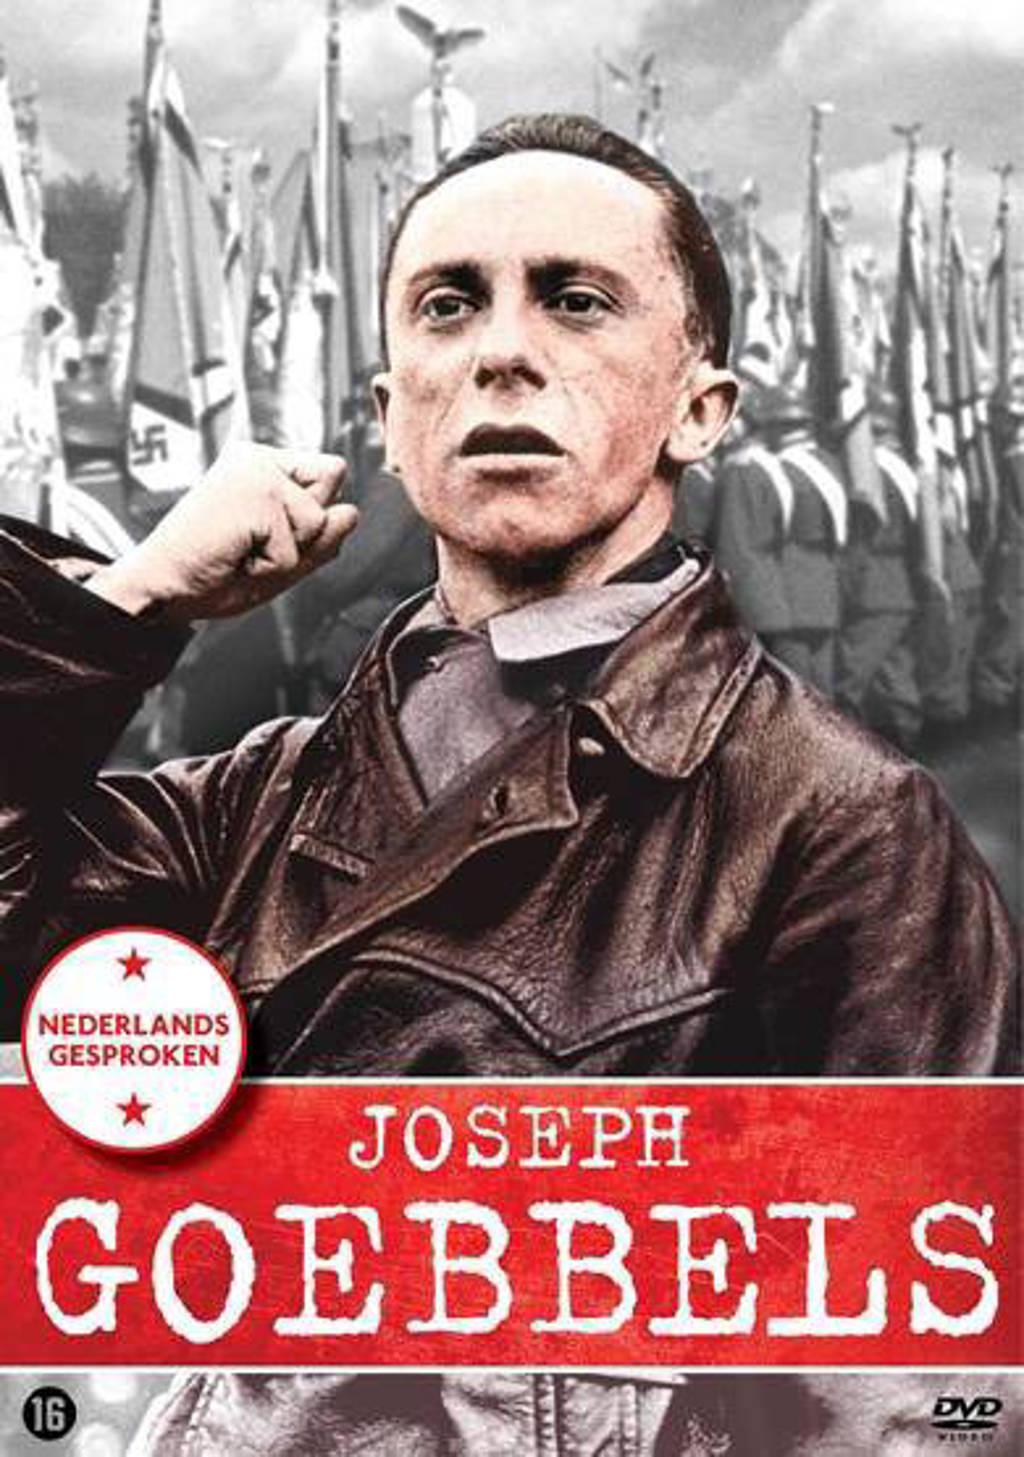 Joseph Goebbels (DVD)